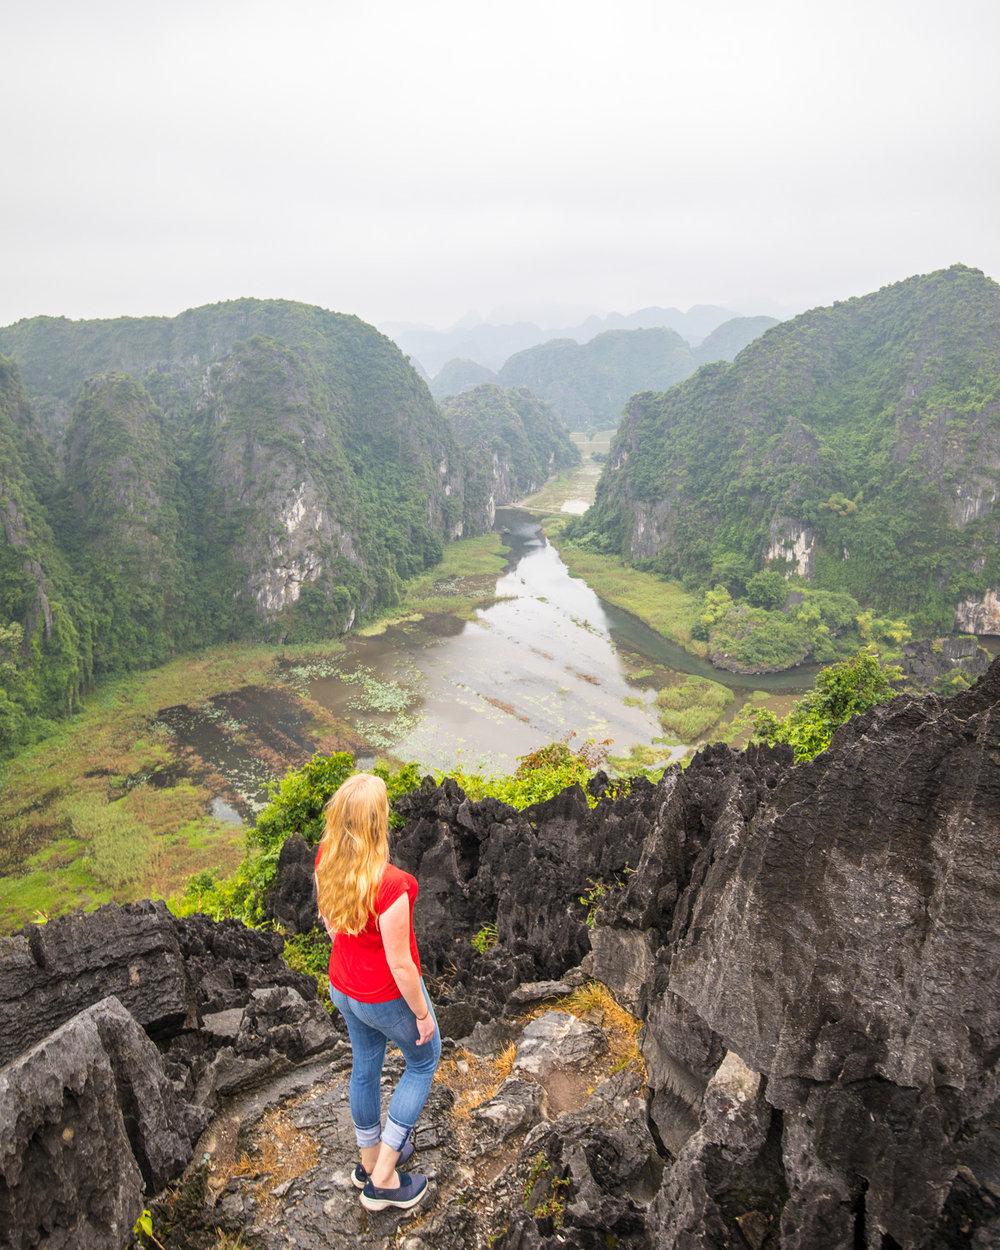 Mua Caves (Hang Mua) - Viewpoints